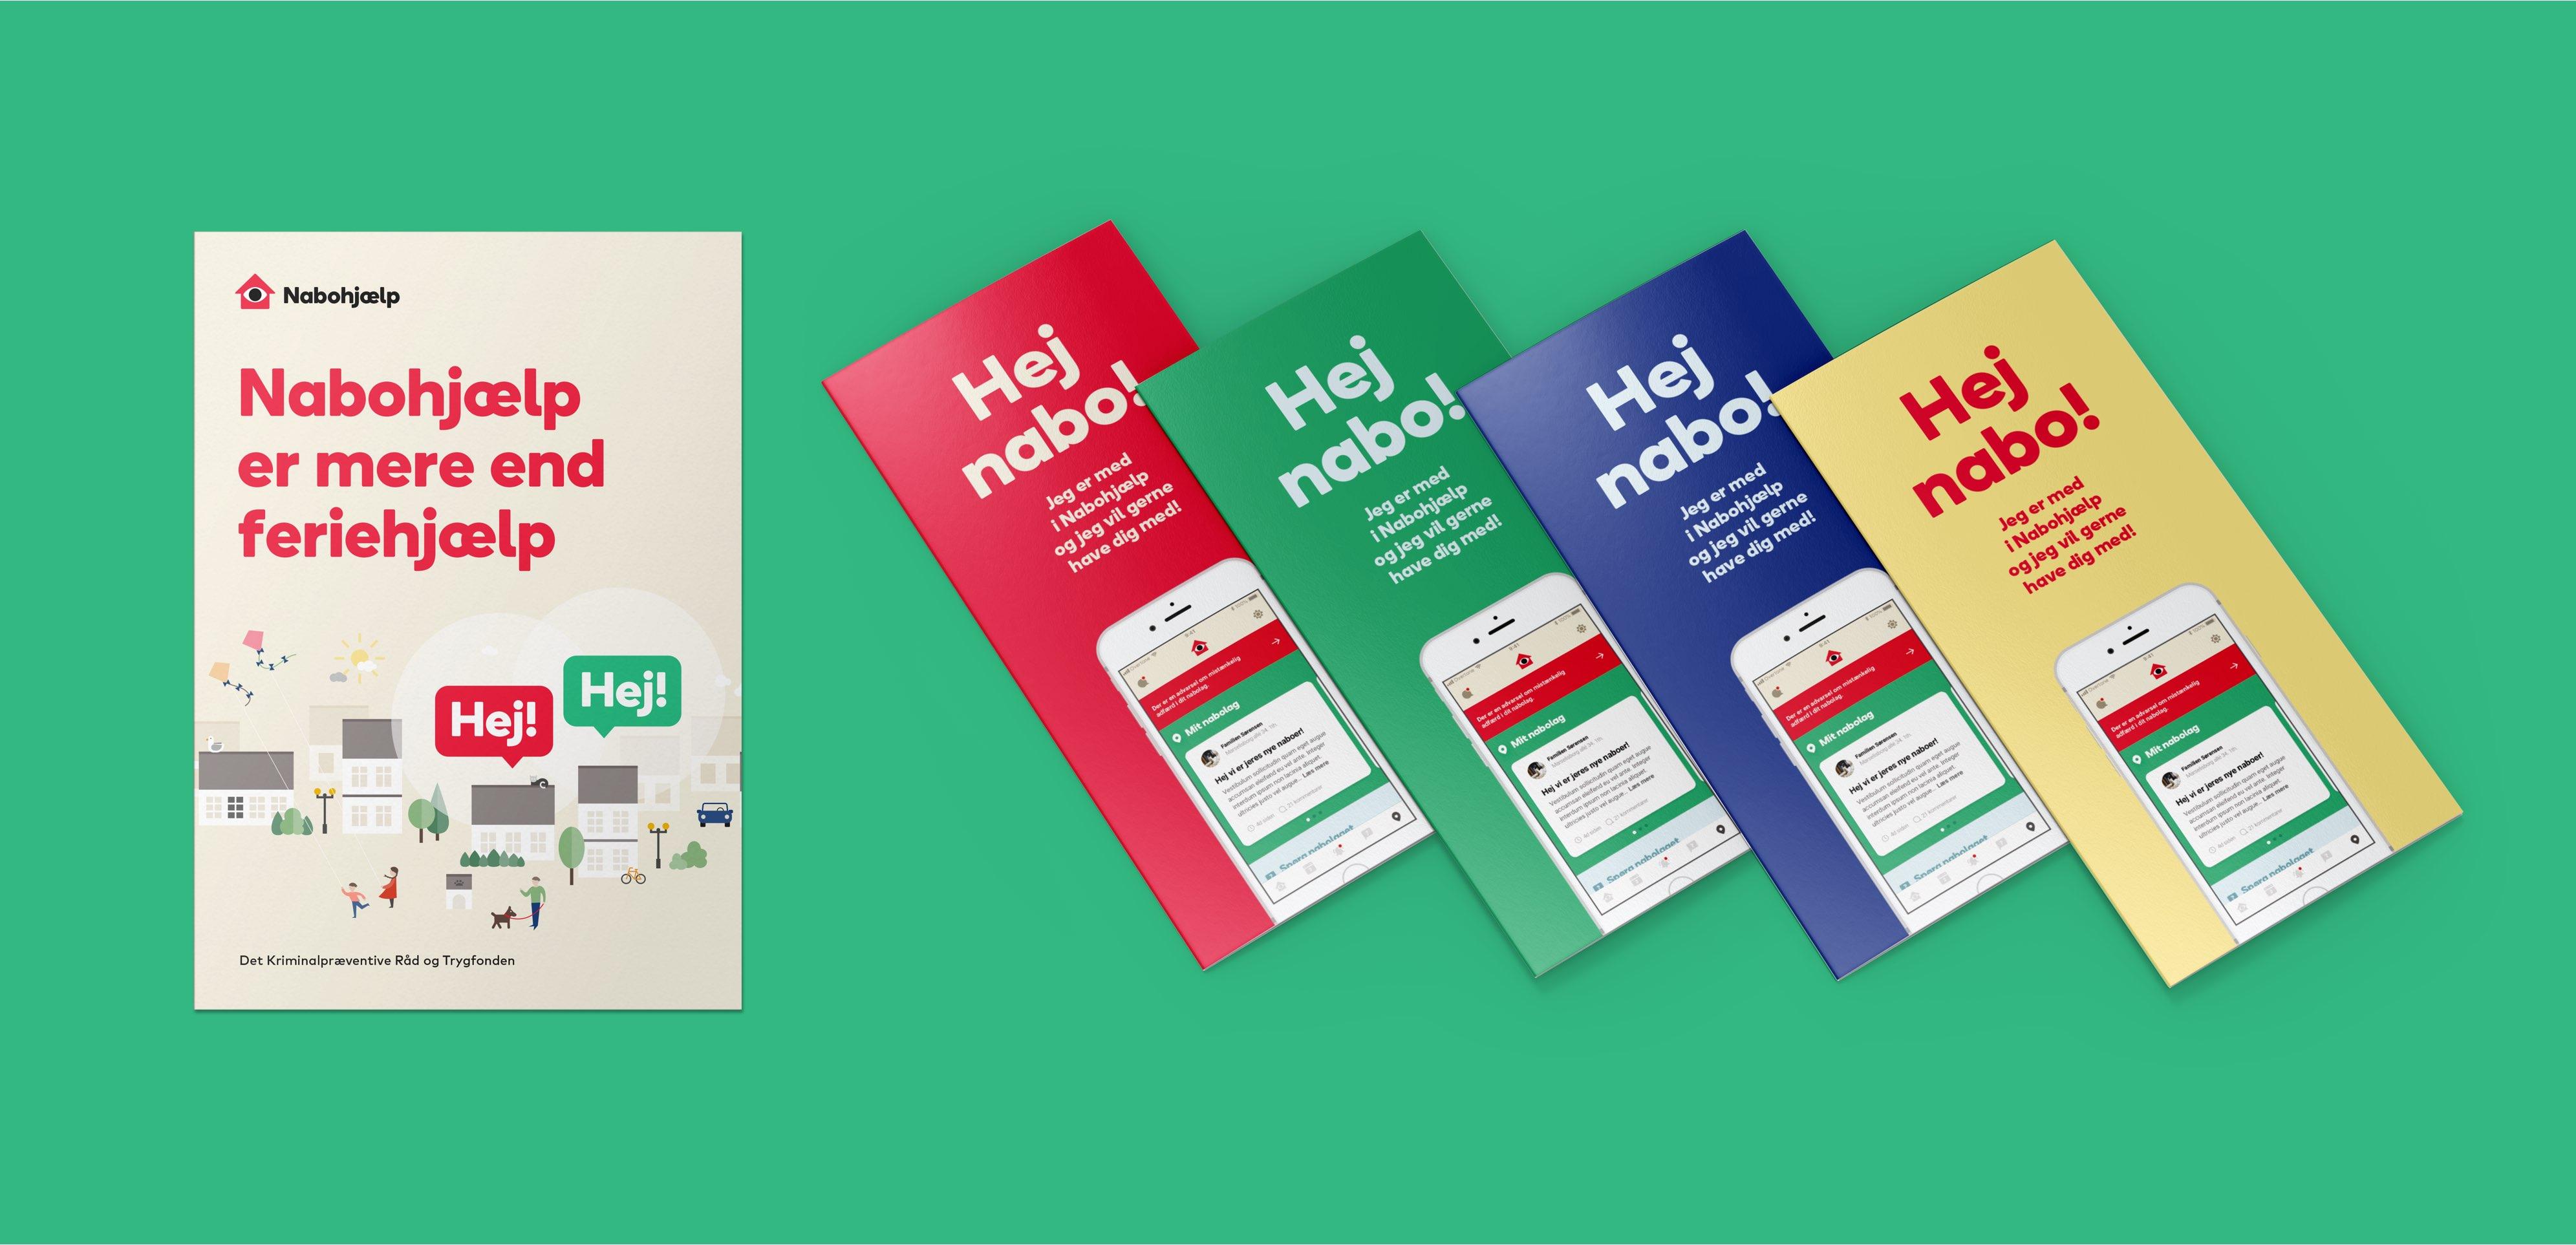 overtone-nabohjaelp-brochure